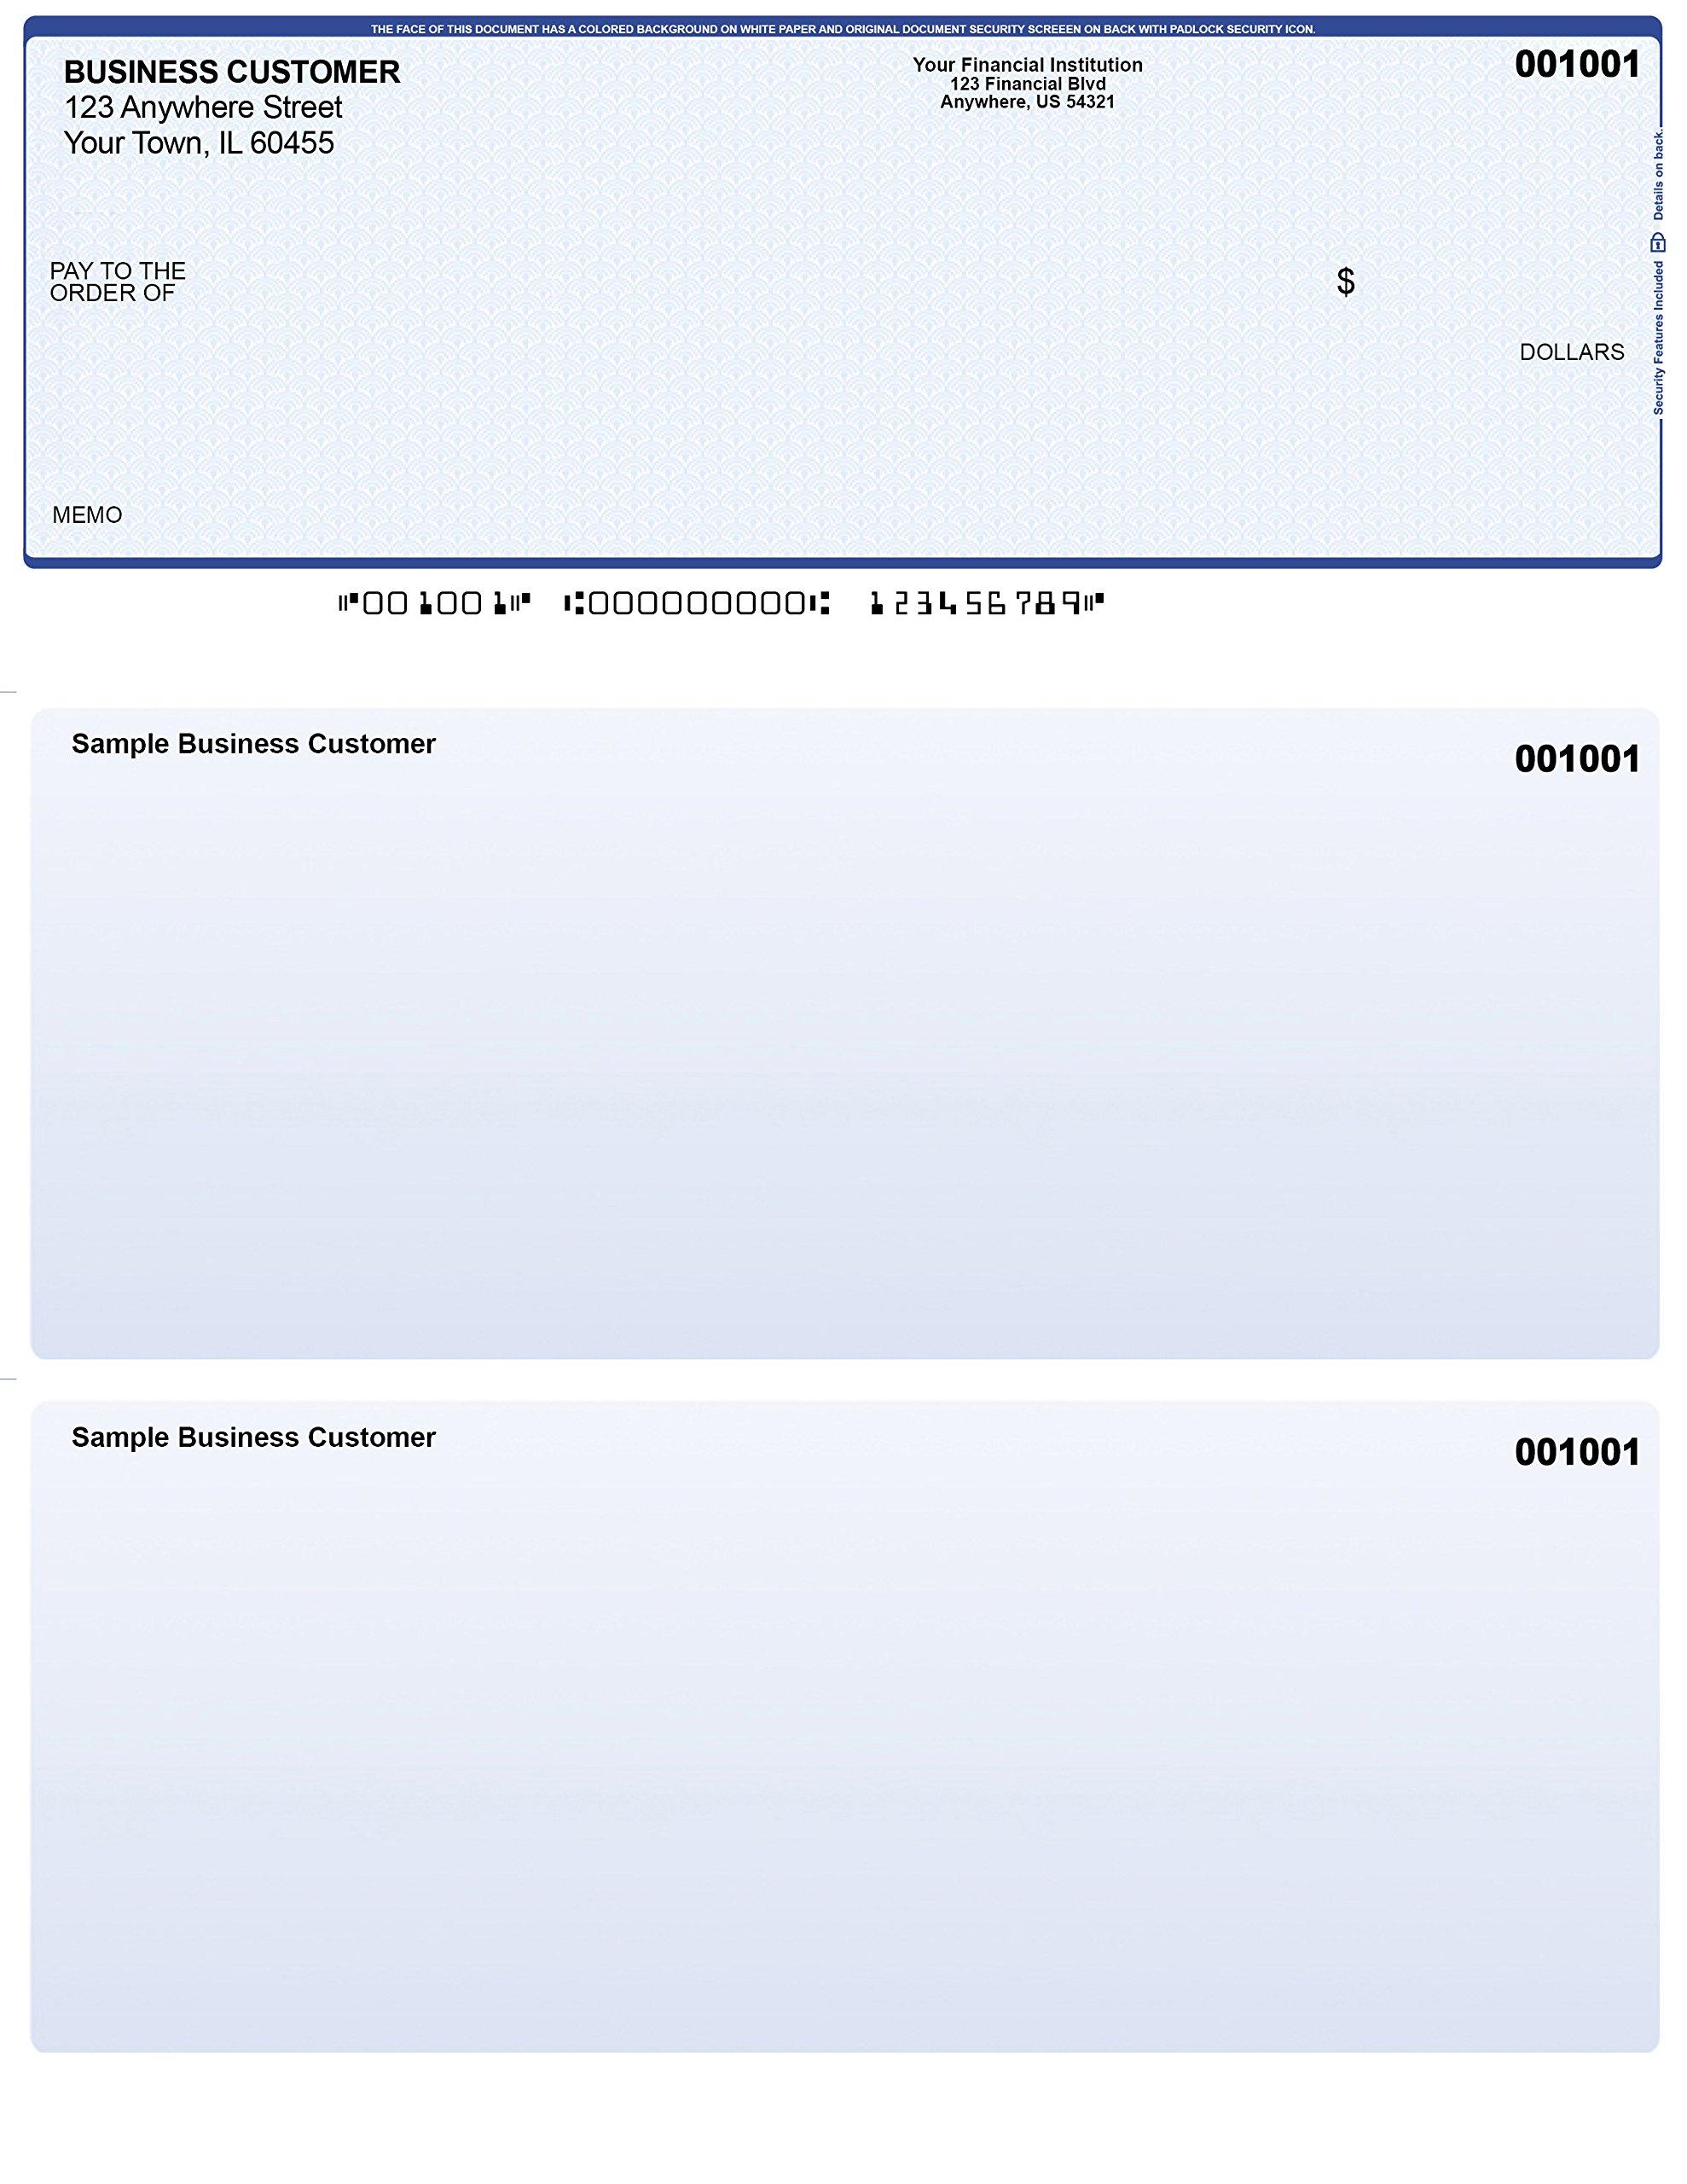 Blue Safety Computer Checks - 1,000 Printed Laser Computer Voucher Checks - Compatible for Quickbooks